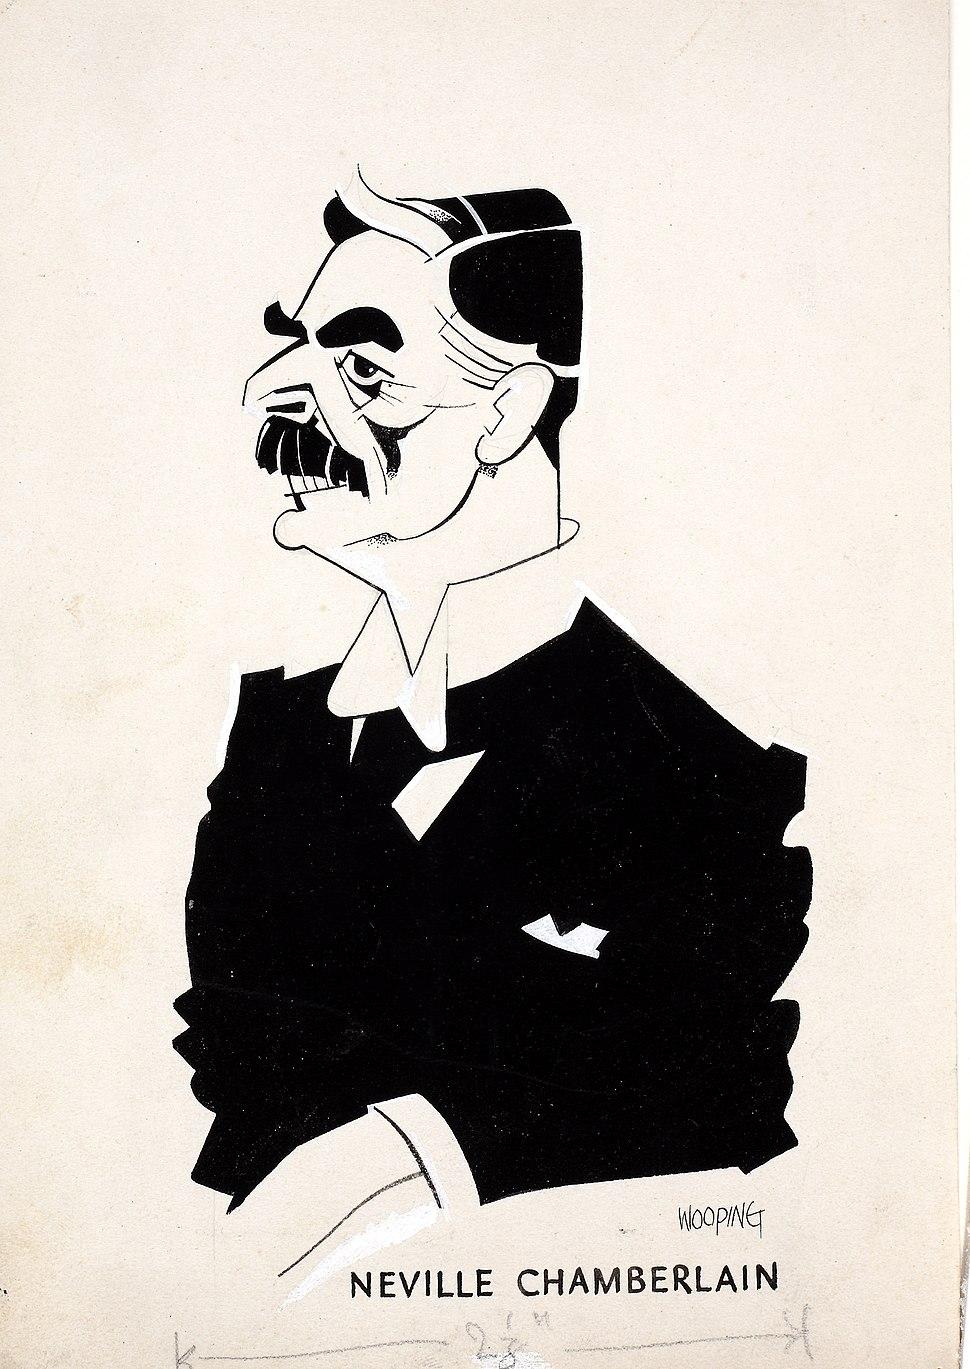 INF3-46 Neville Chamberlain Artist Wooding